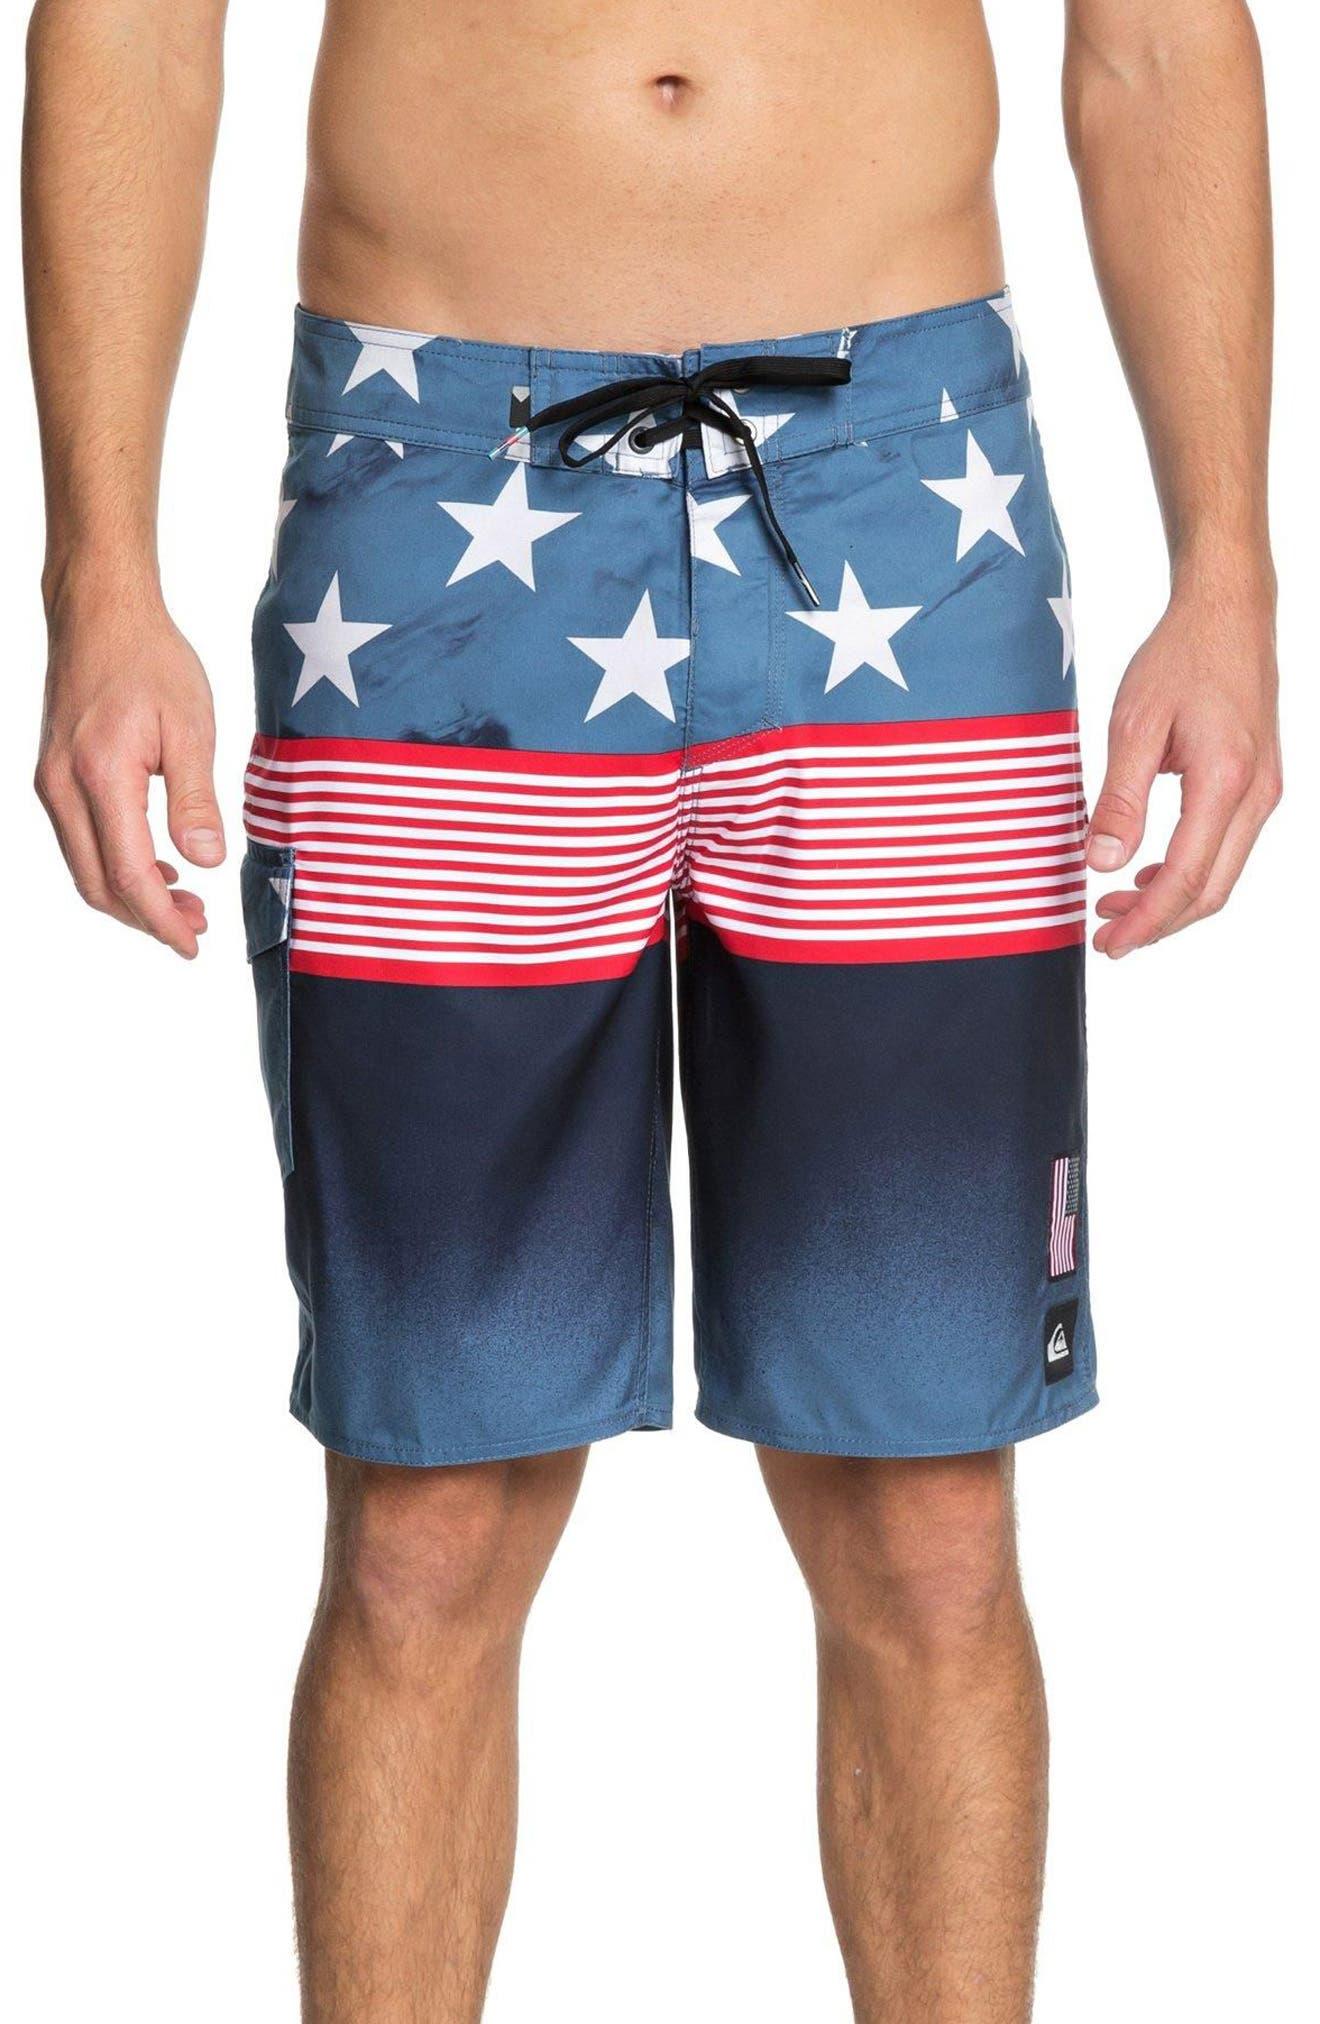 Division Independent Board Shorts,                             Main thumbnail 1, color,                             410